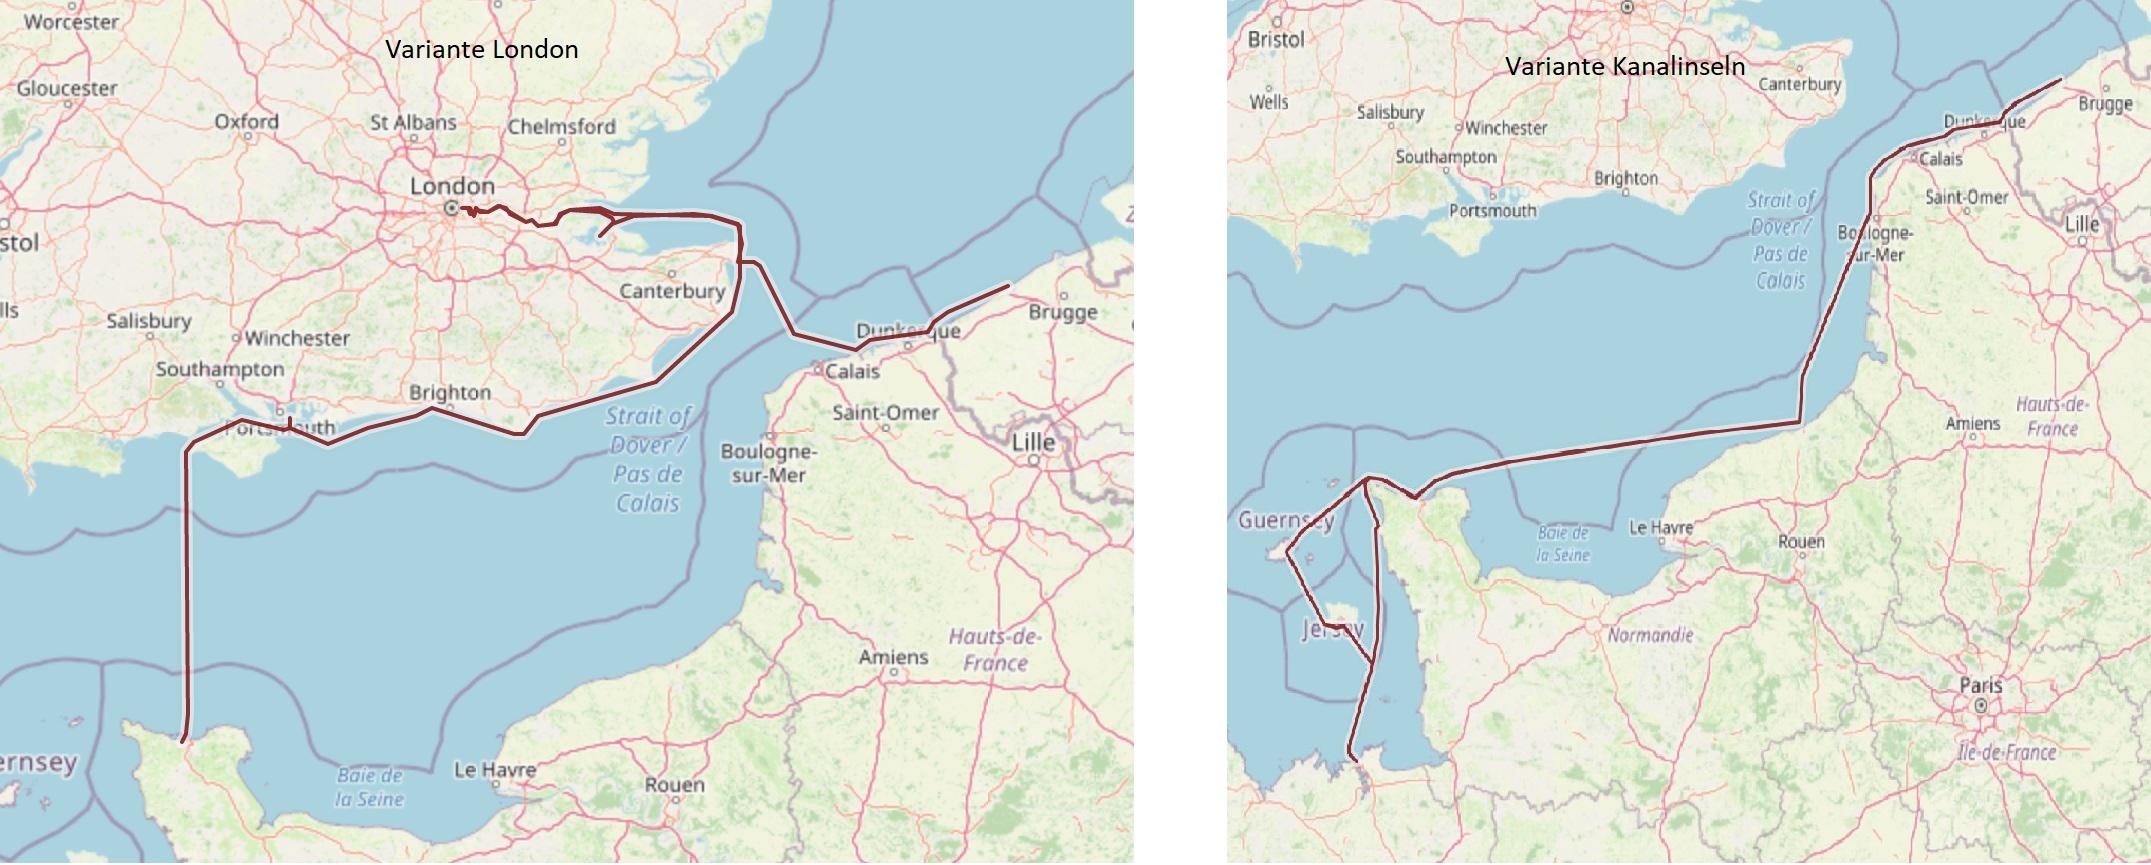 BO21-02 Oostende - Cherbourg